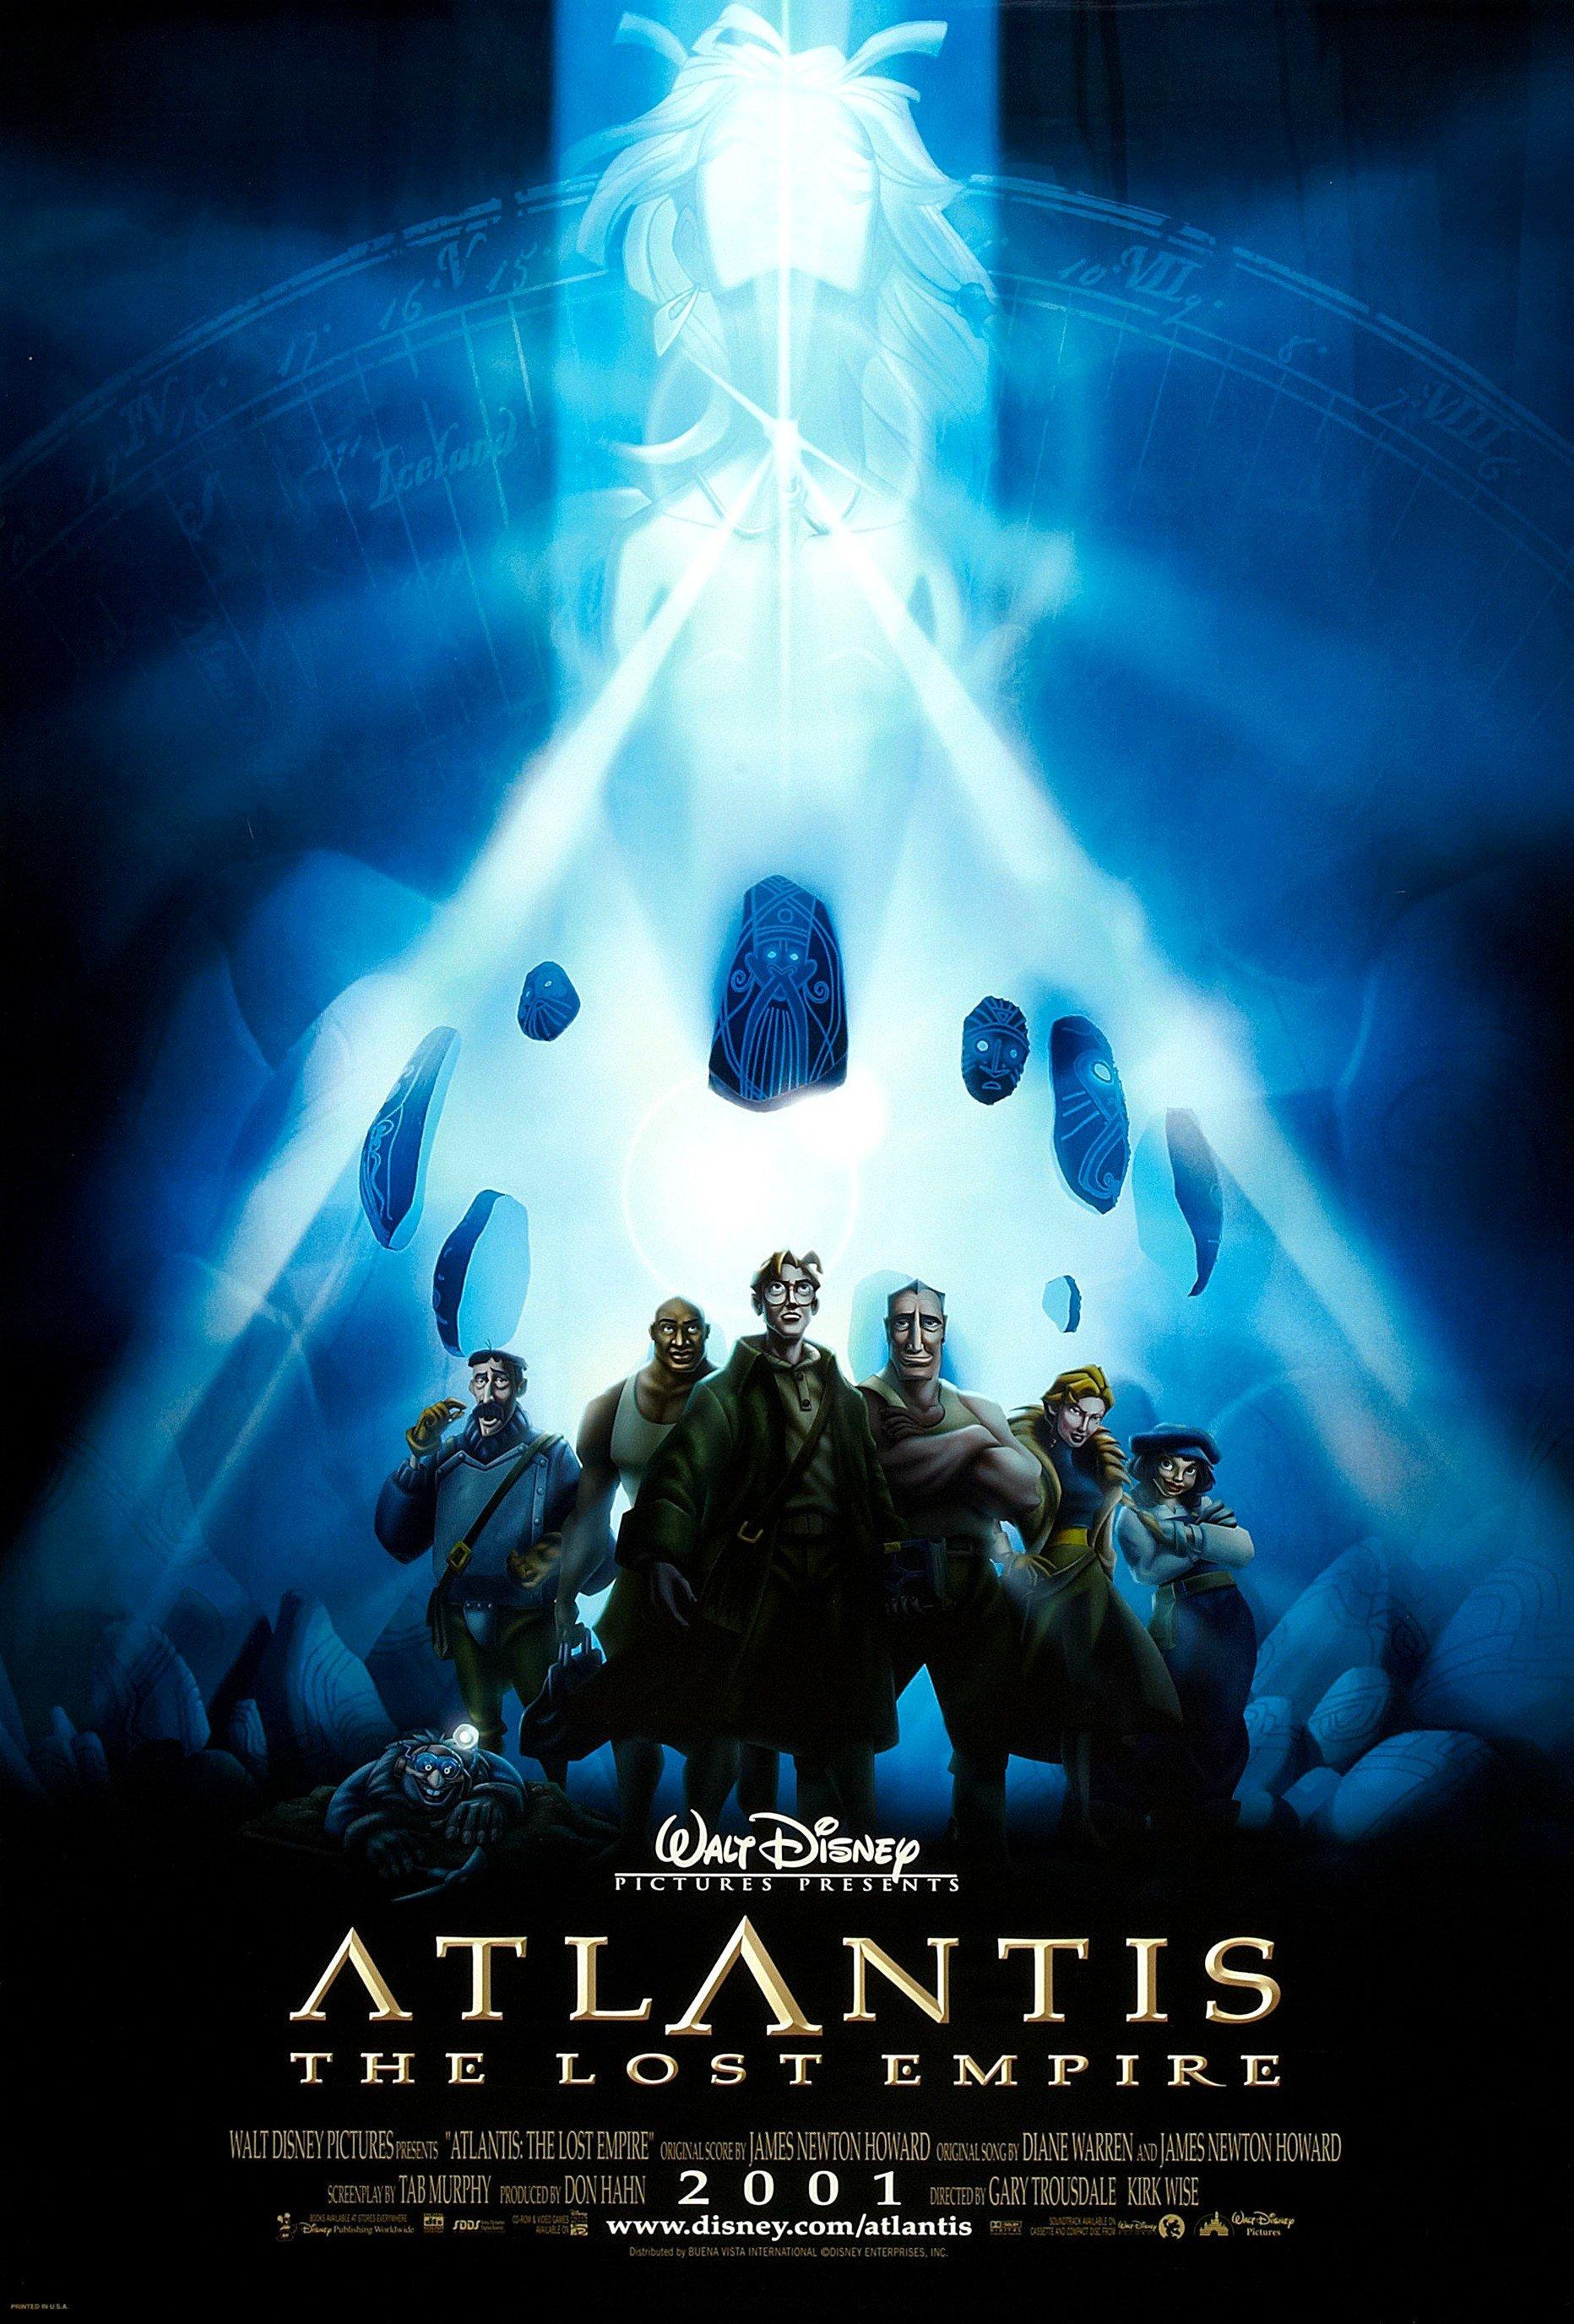 Walt Disney's Atlantis movie poster.